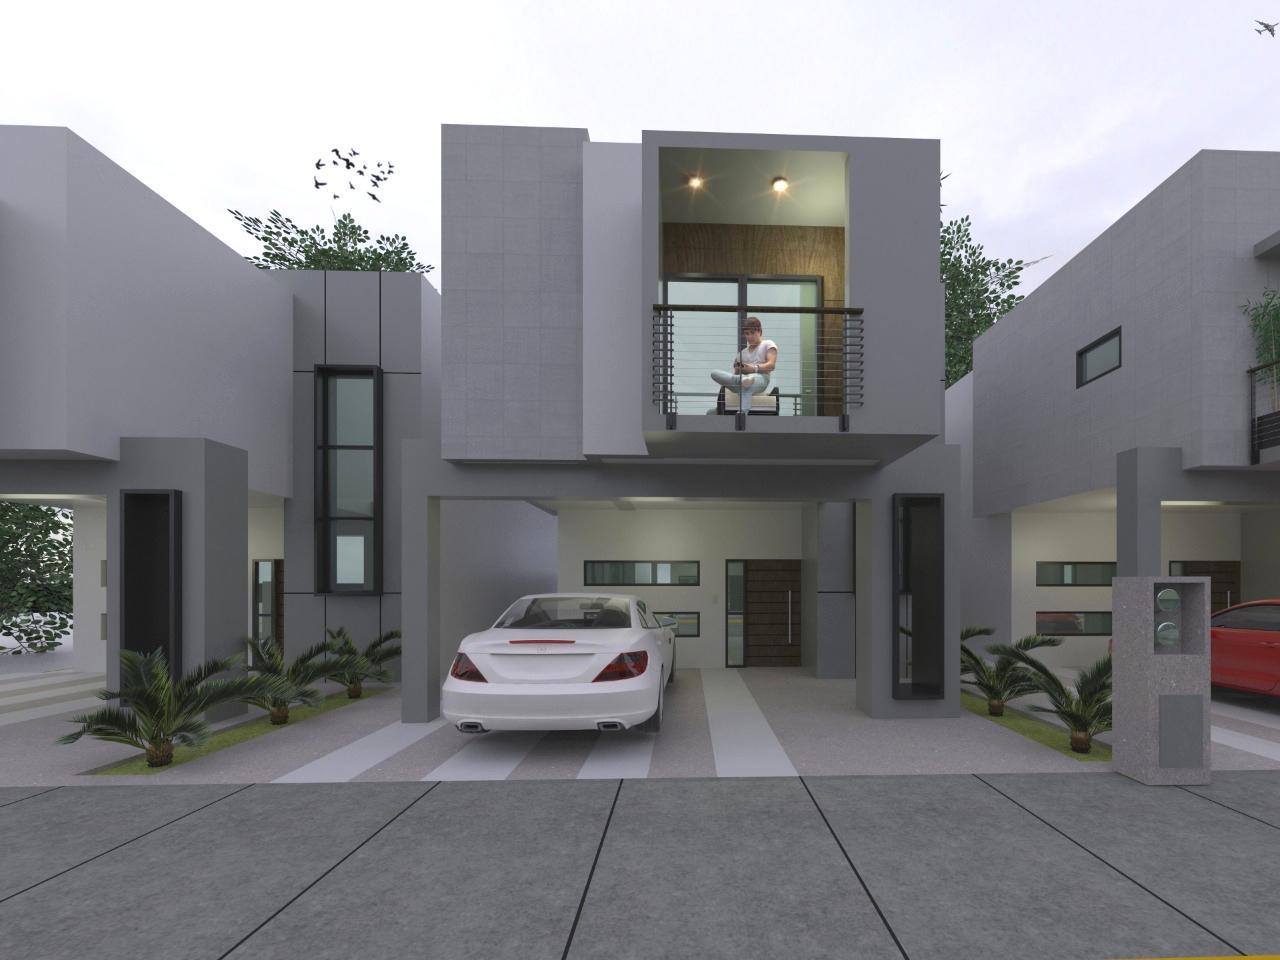 foto de casas inventa cd Juarez